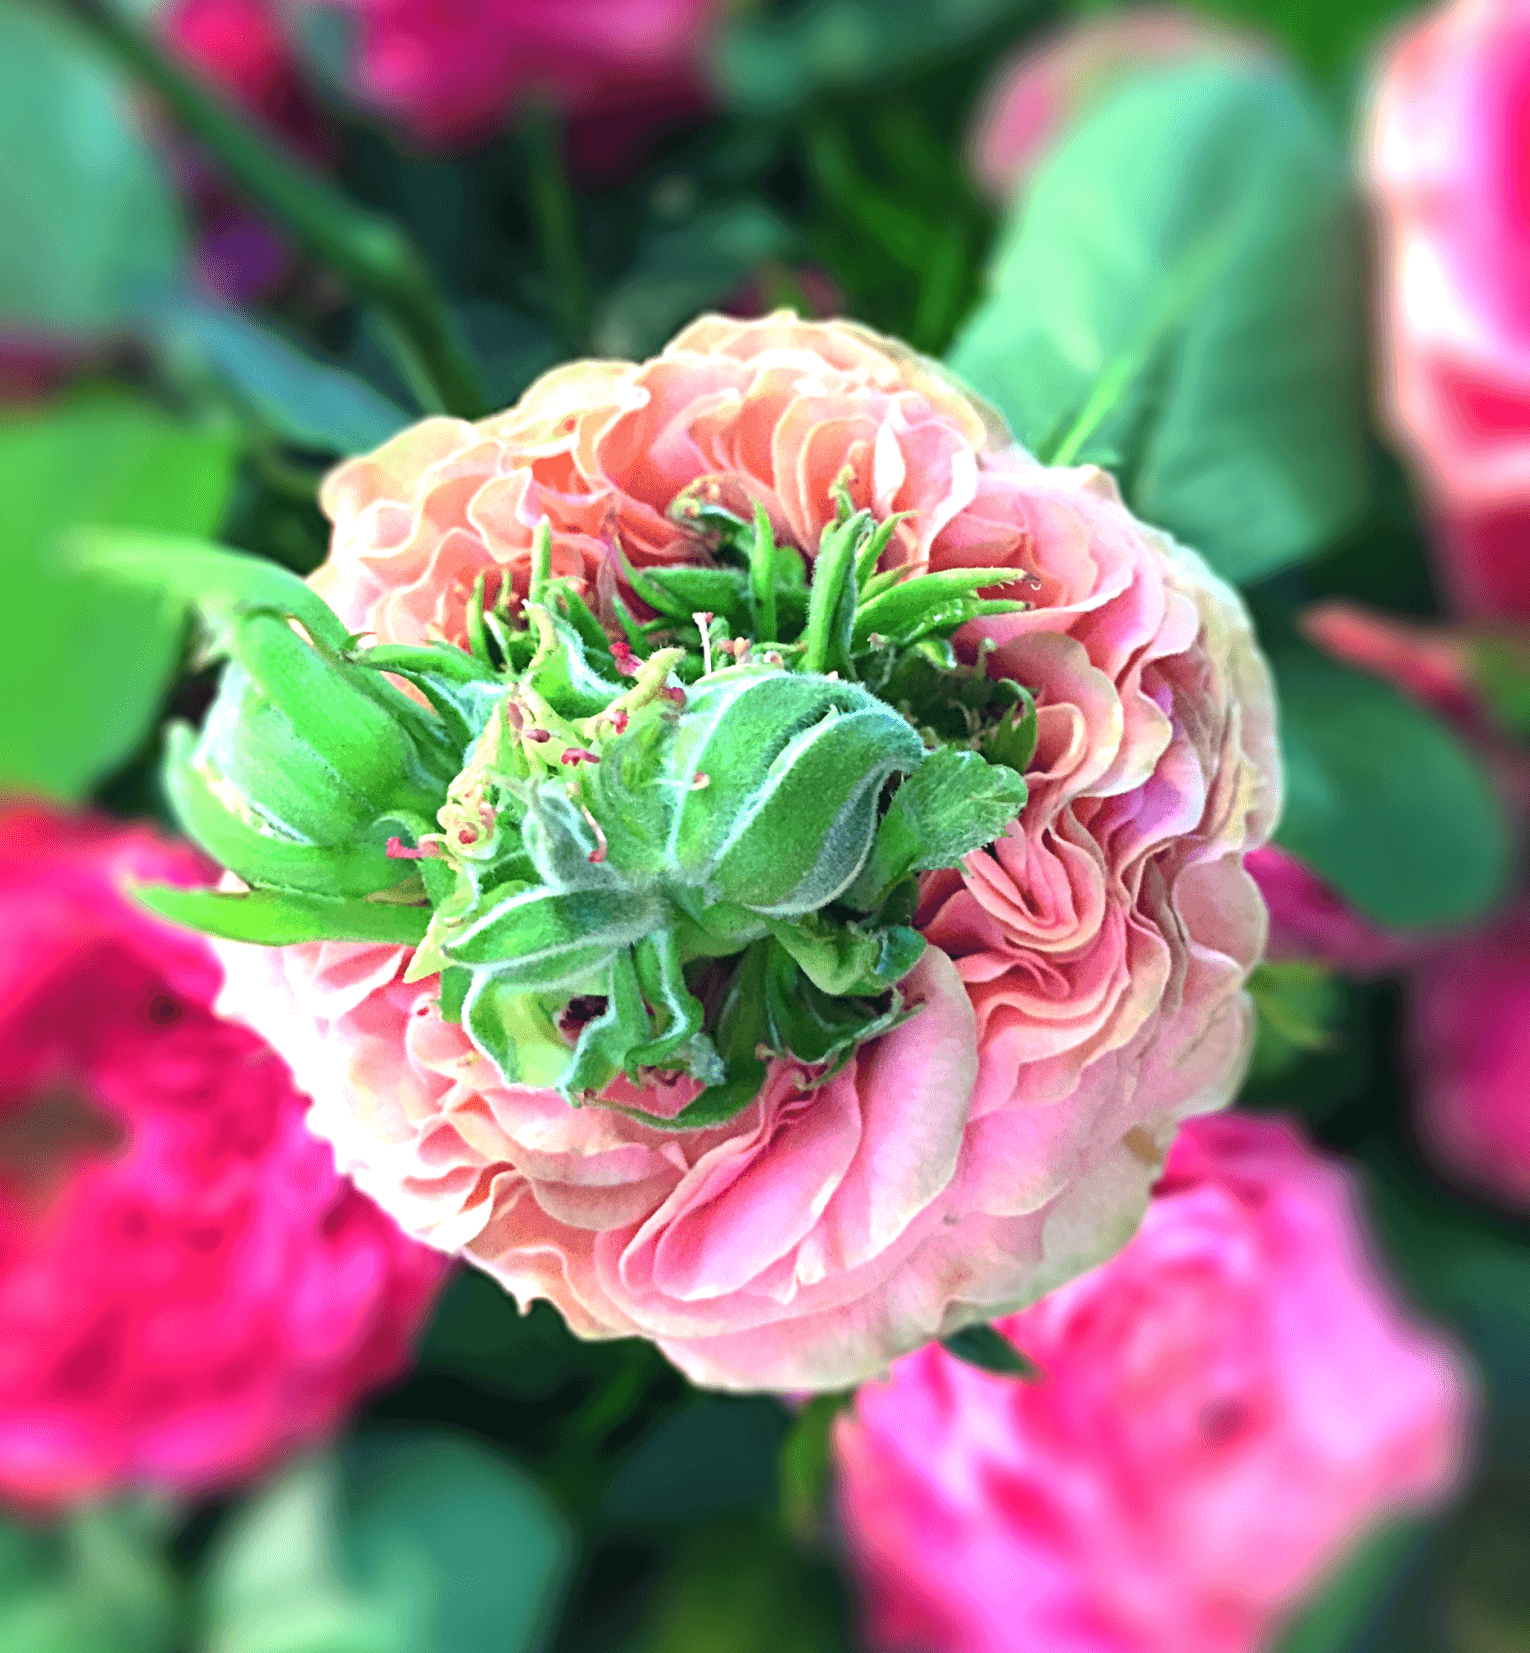 Rose mit gruenem Herzen nah